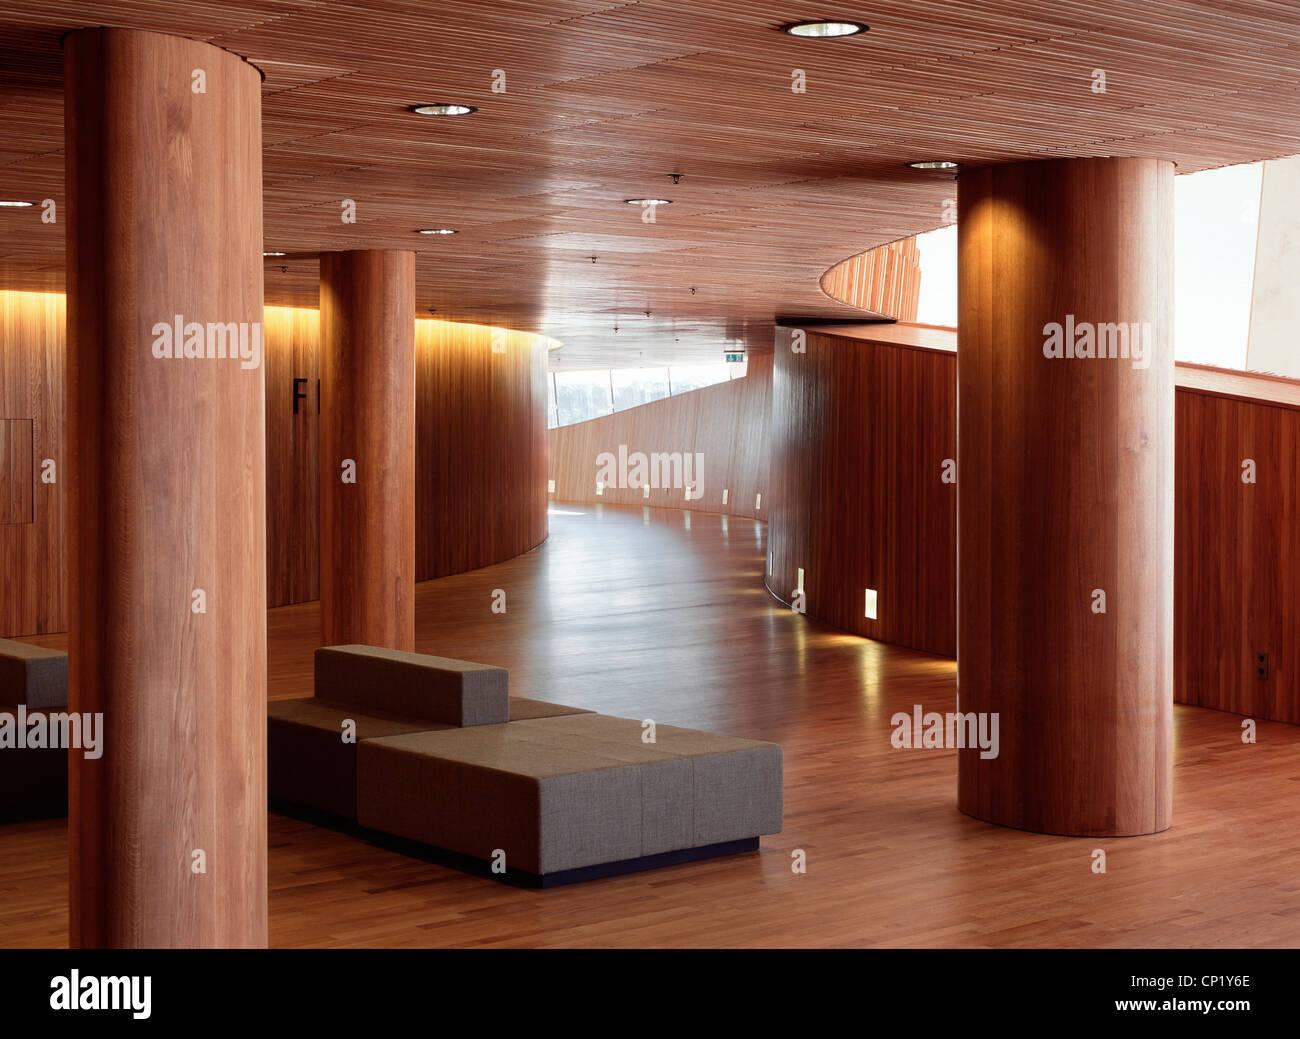 Oslo Opera House, Bjorvika, Architects: Architects: Snohetta - Stock Image